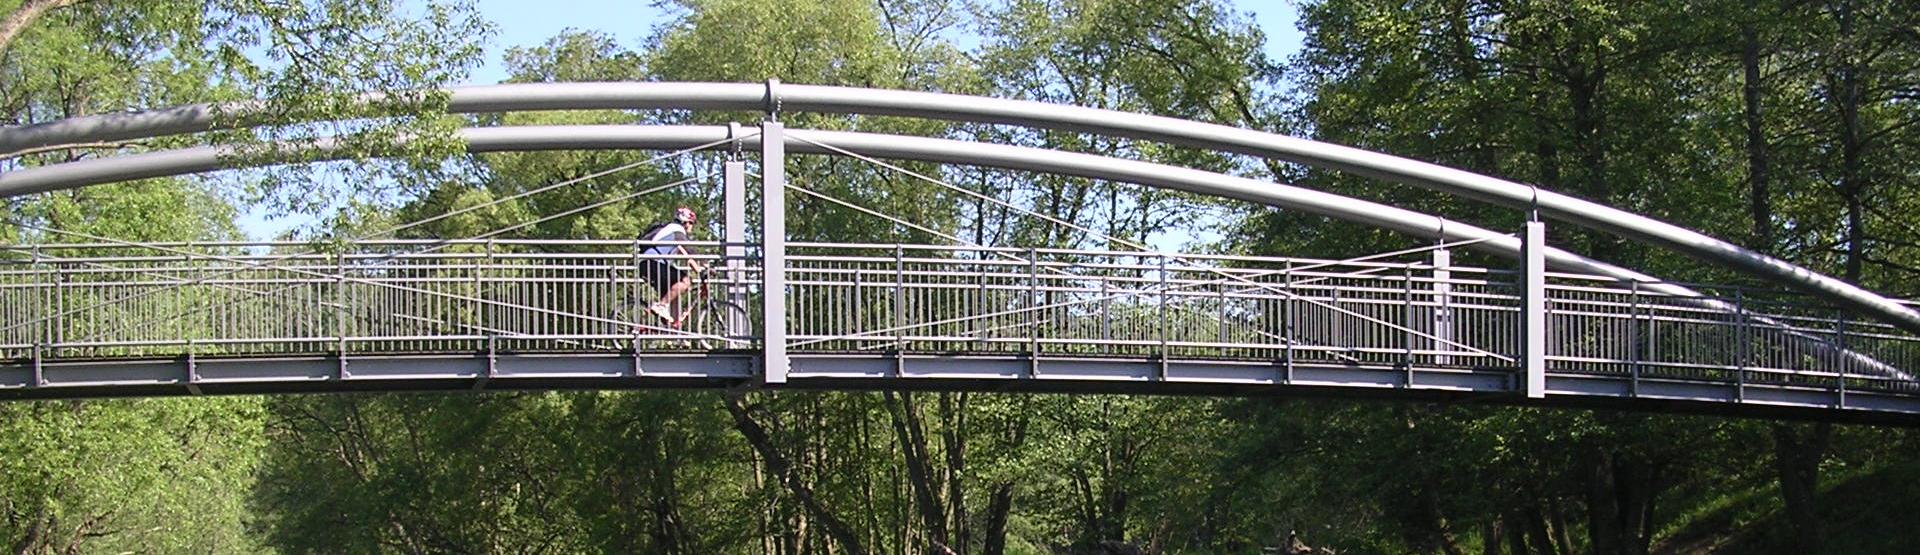 Radbrücke Dodenau / Eder-Radweg